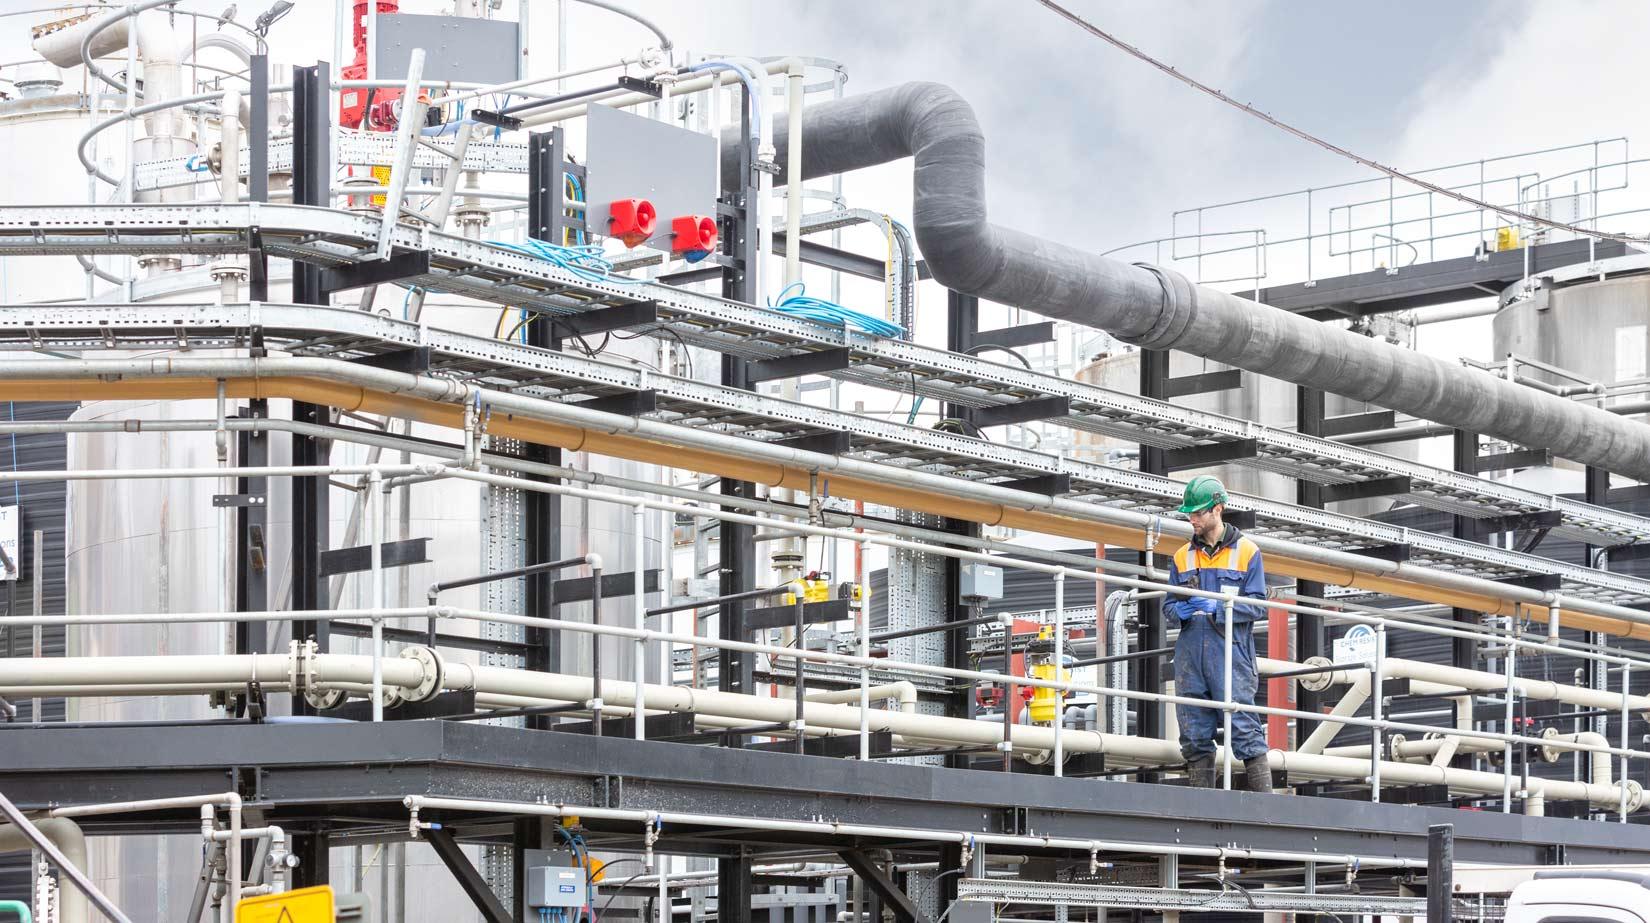 Industrial-photoshoot-engineer-inspects-valve